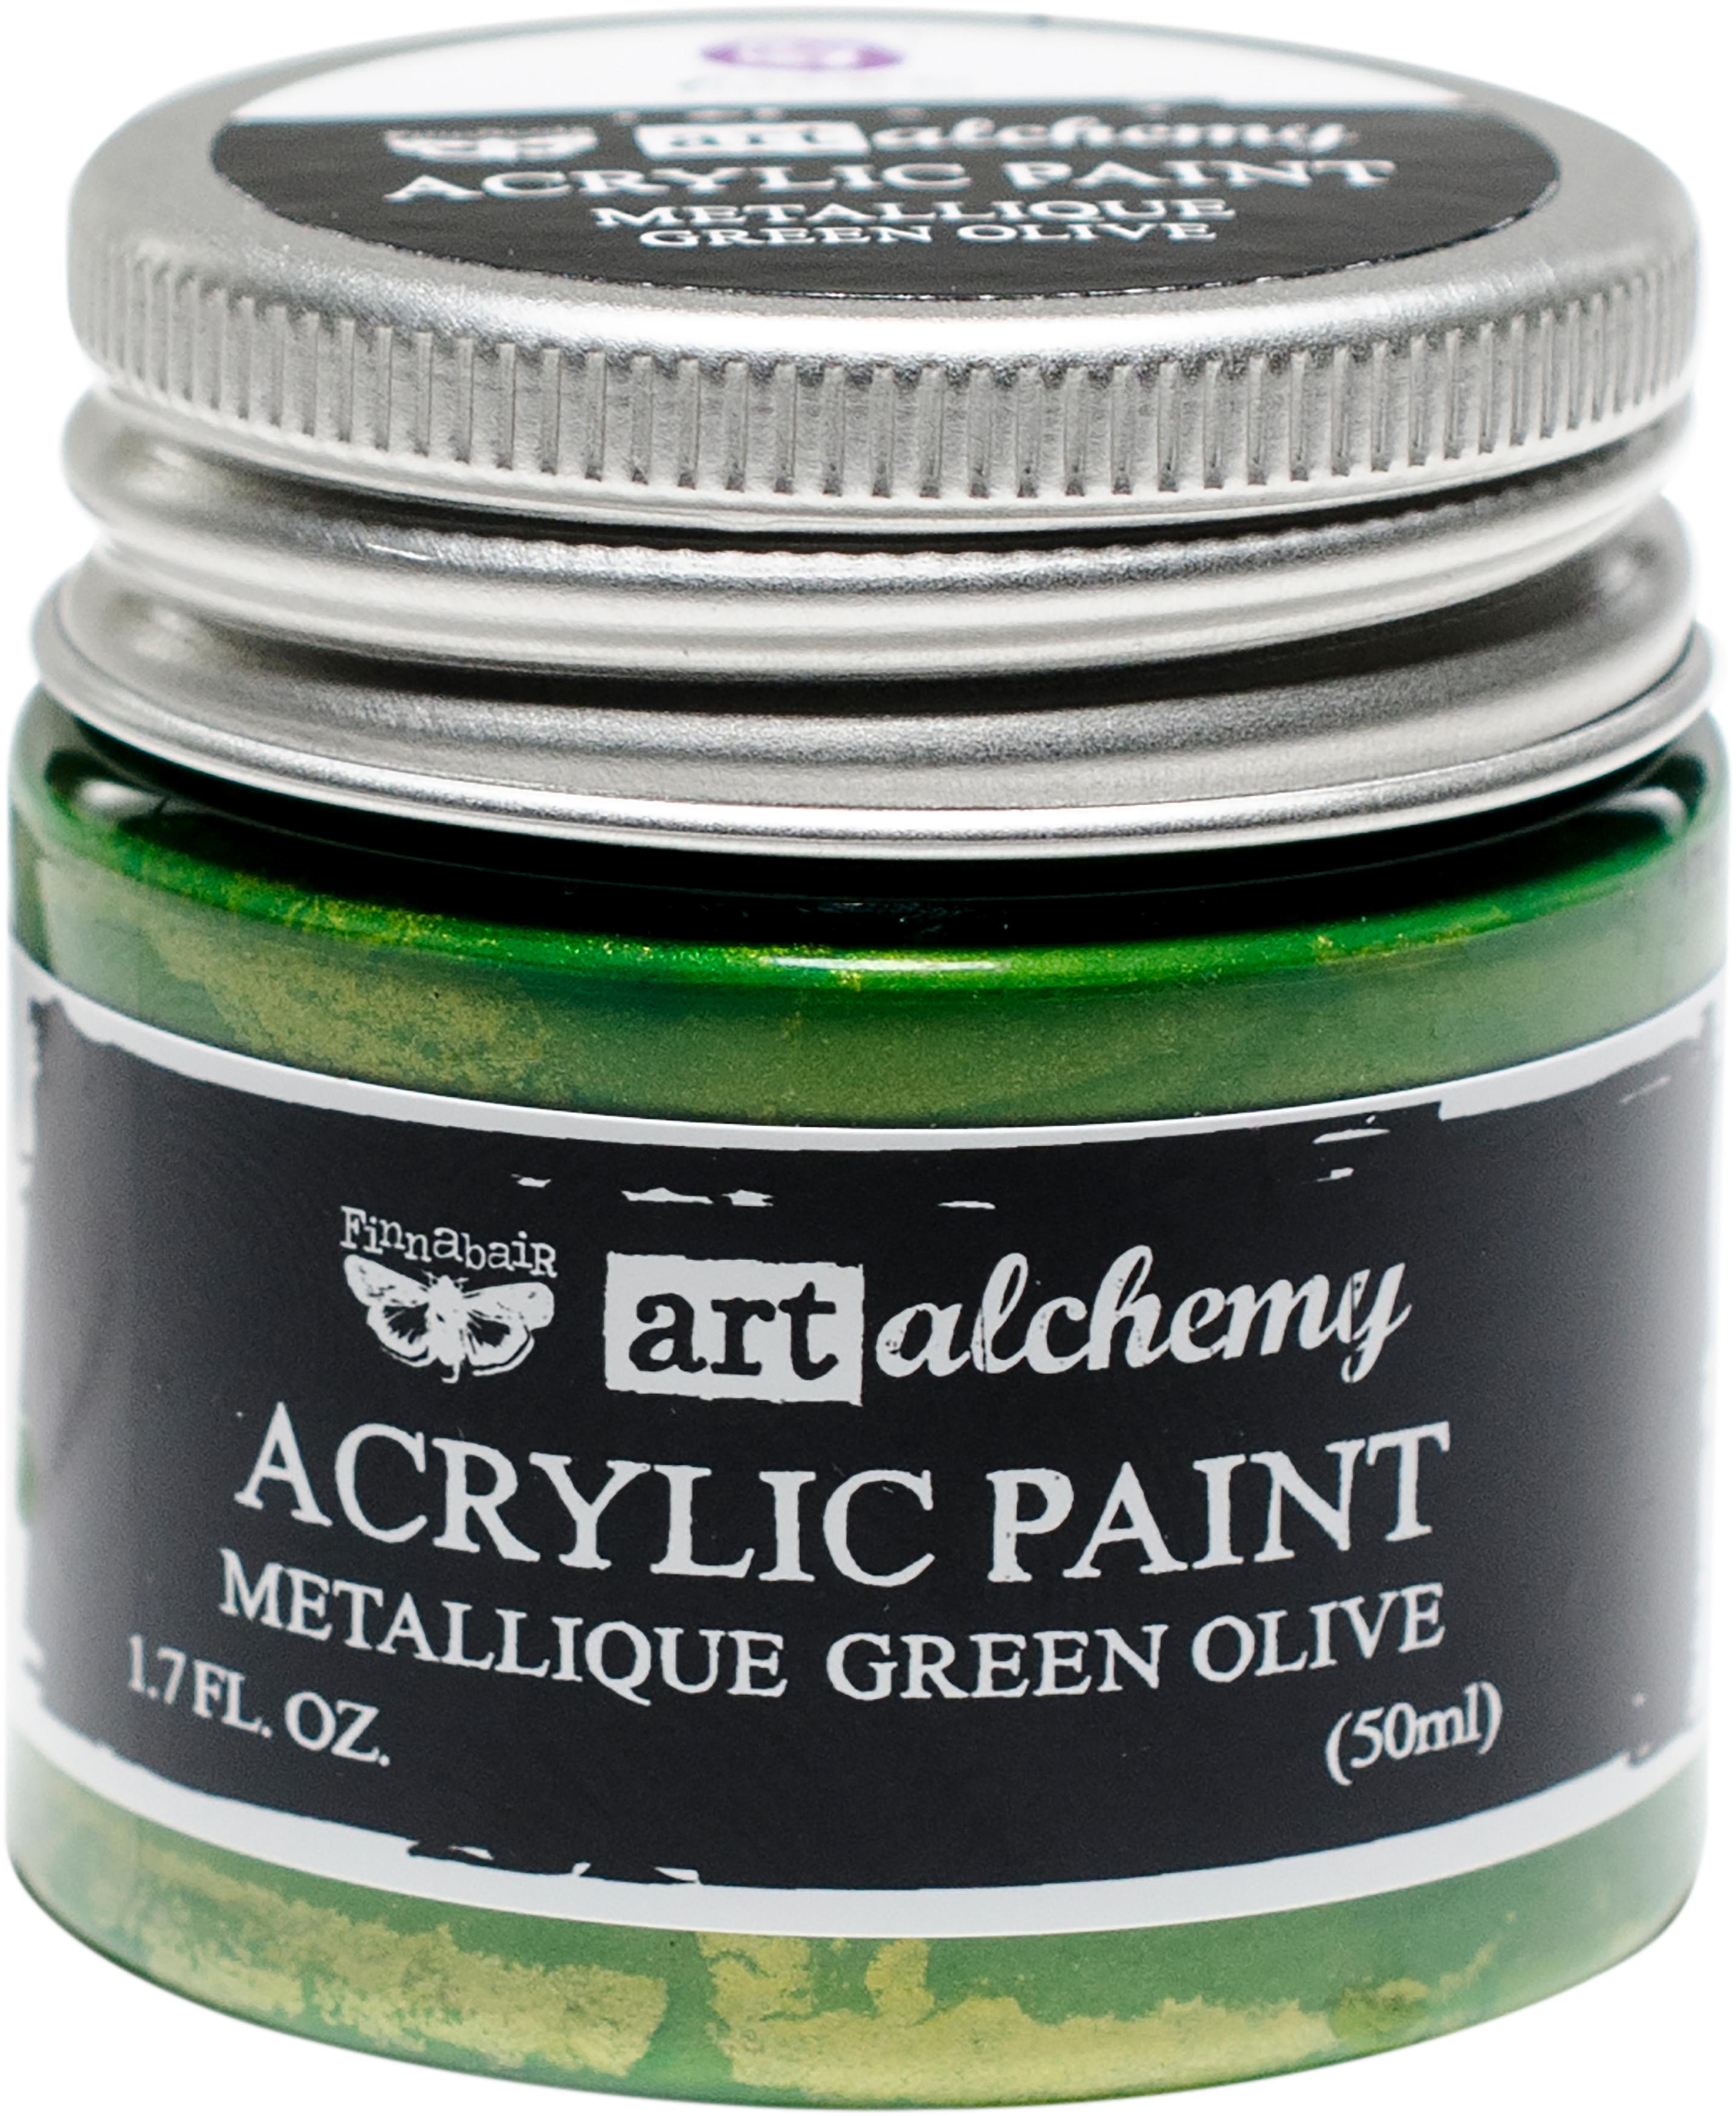 FB Metallique Green Olive